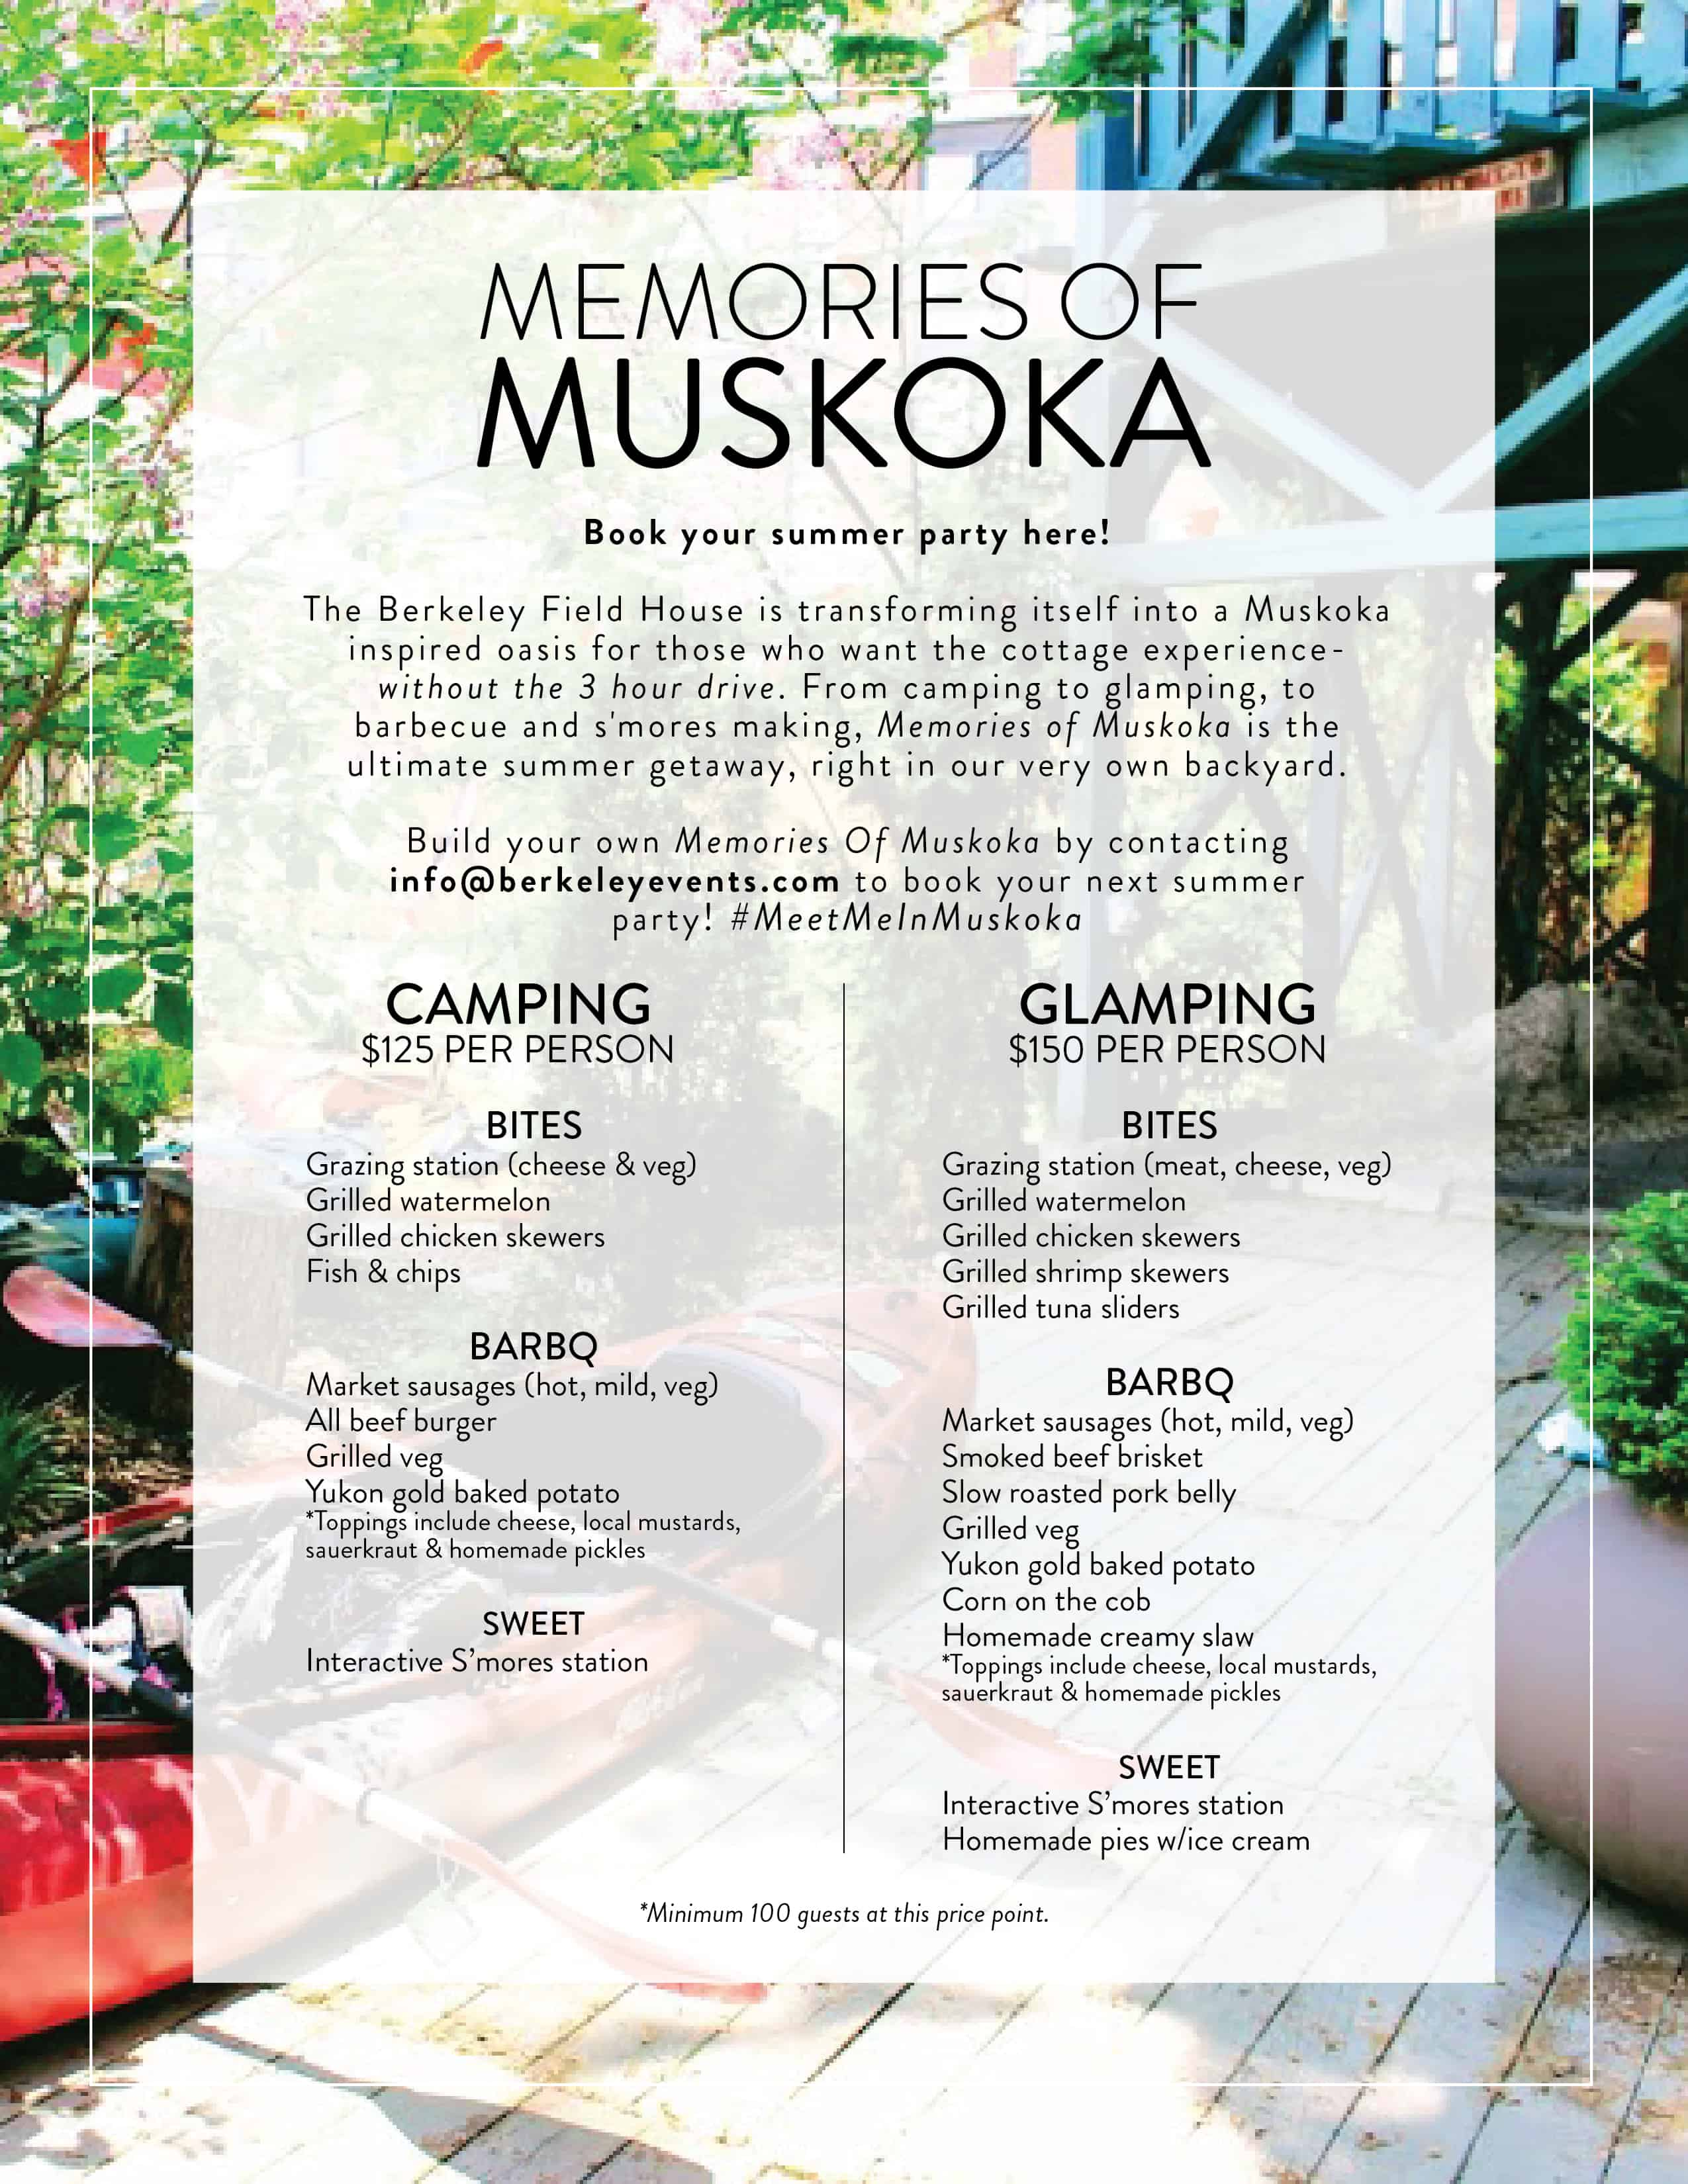 Memories of Muskoka flyer for Berkeley Field House